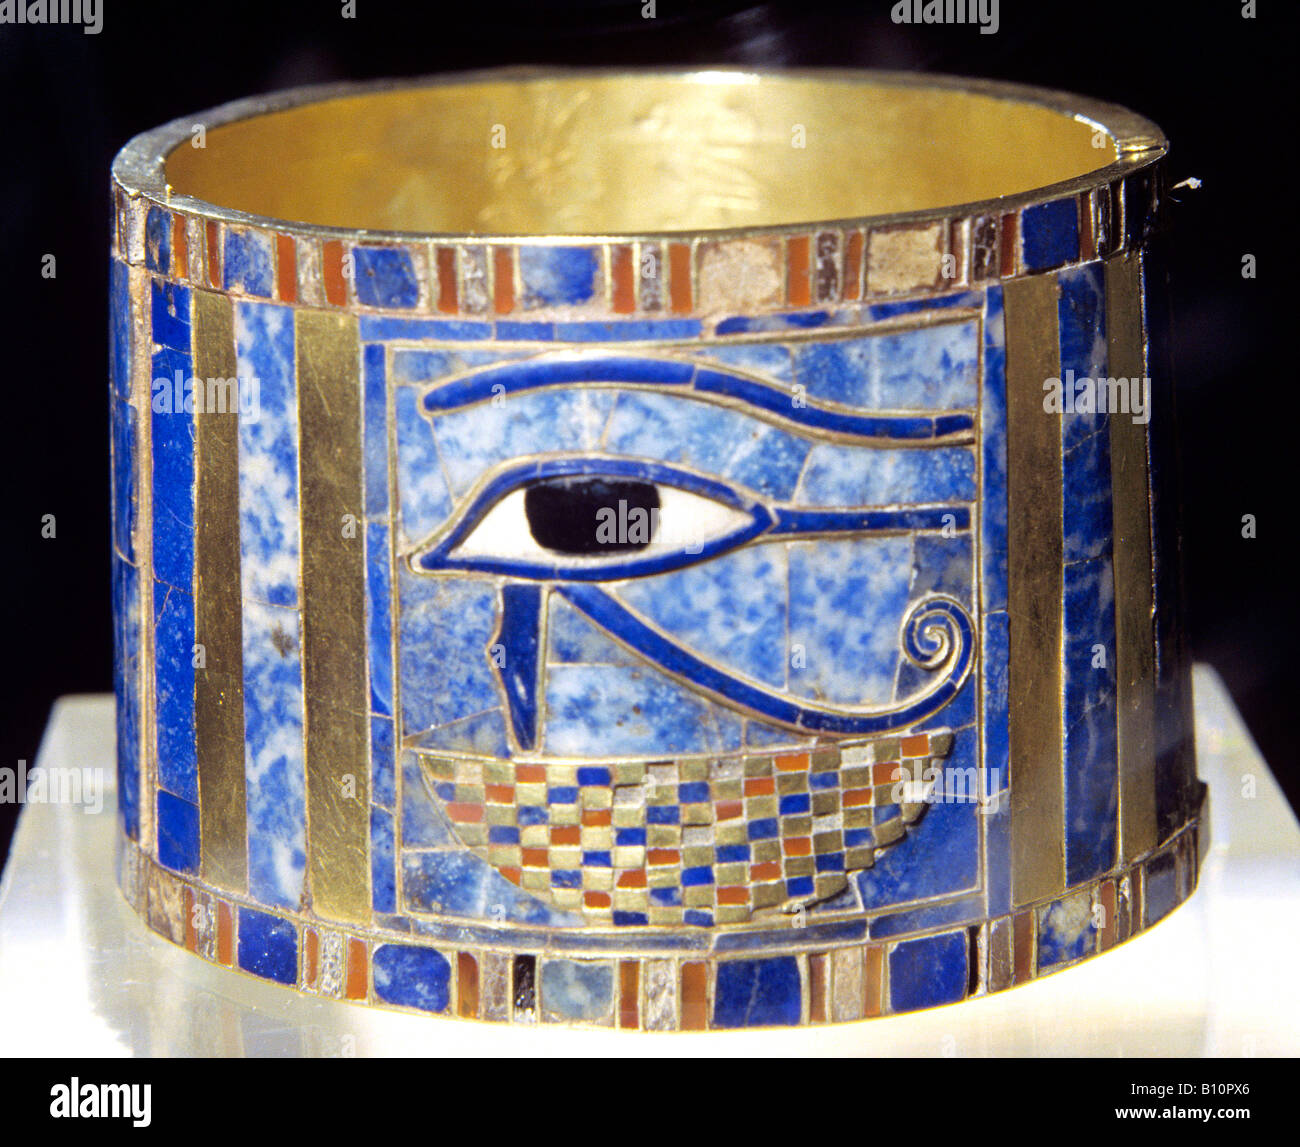 Cuff bracelet with eye Oudjat Tomb of Sheshonq II 930 BC Egypt - Stock Image